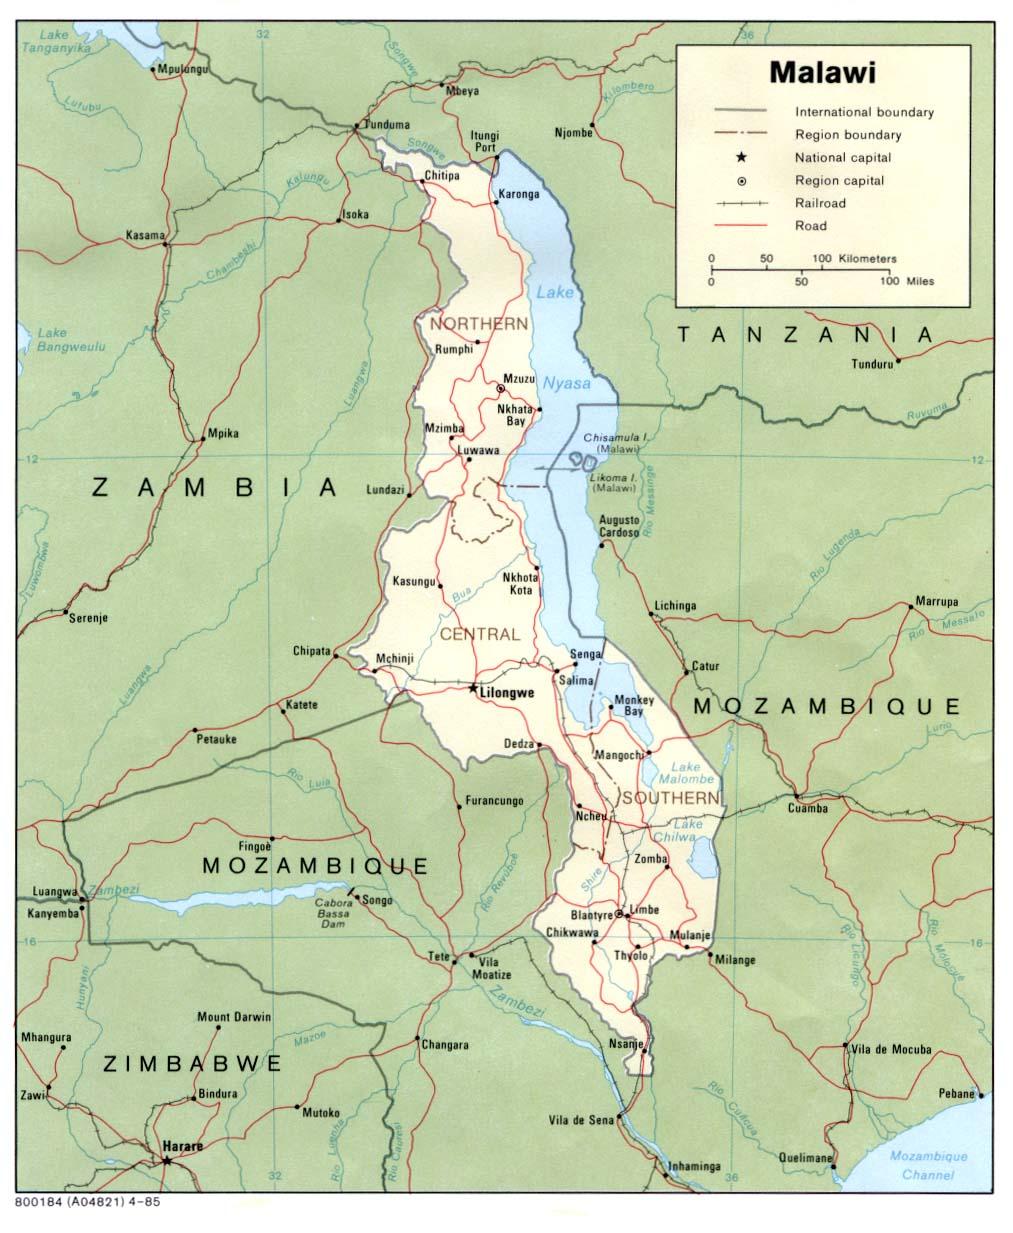 Malawi Map Malawi Africa Mappery - Malawi map